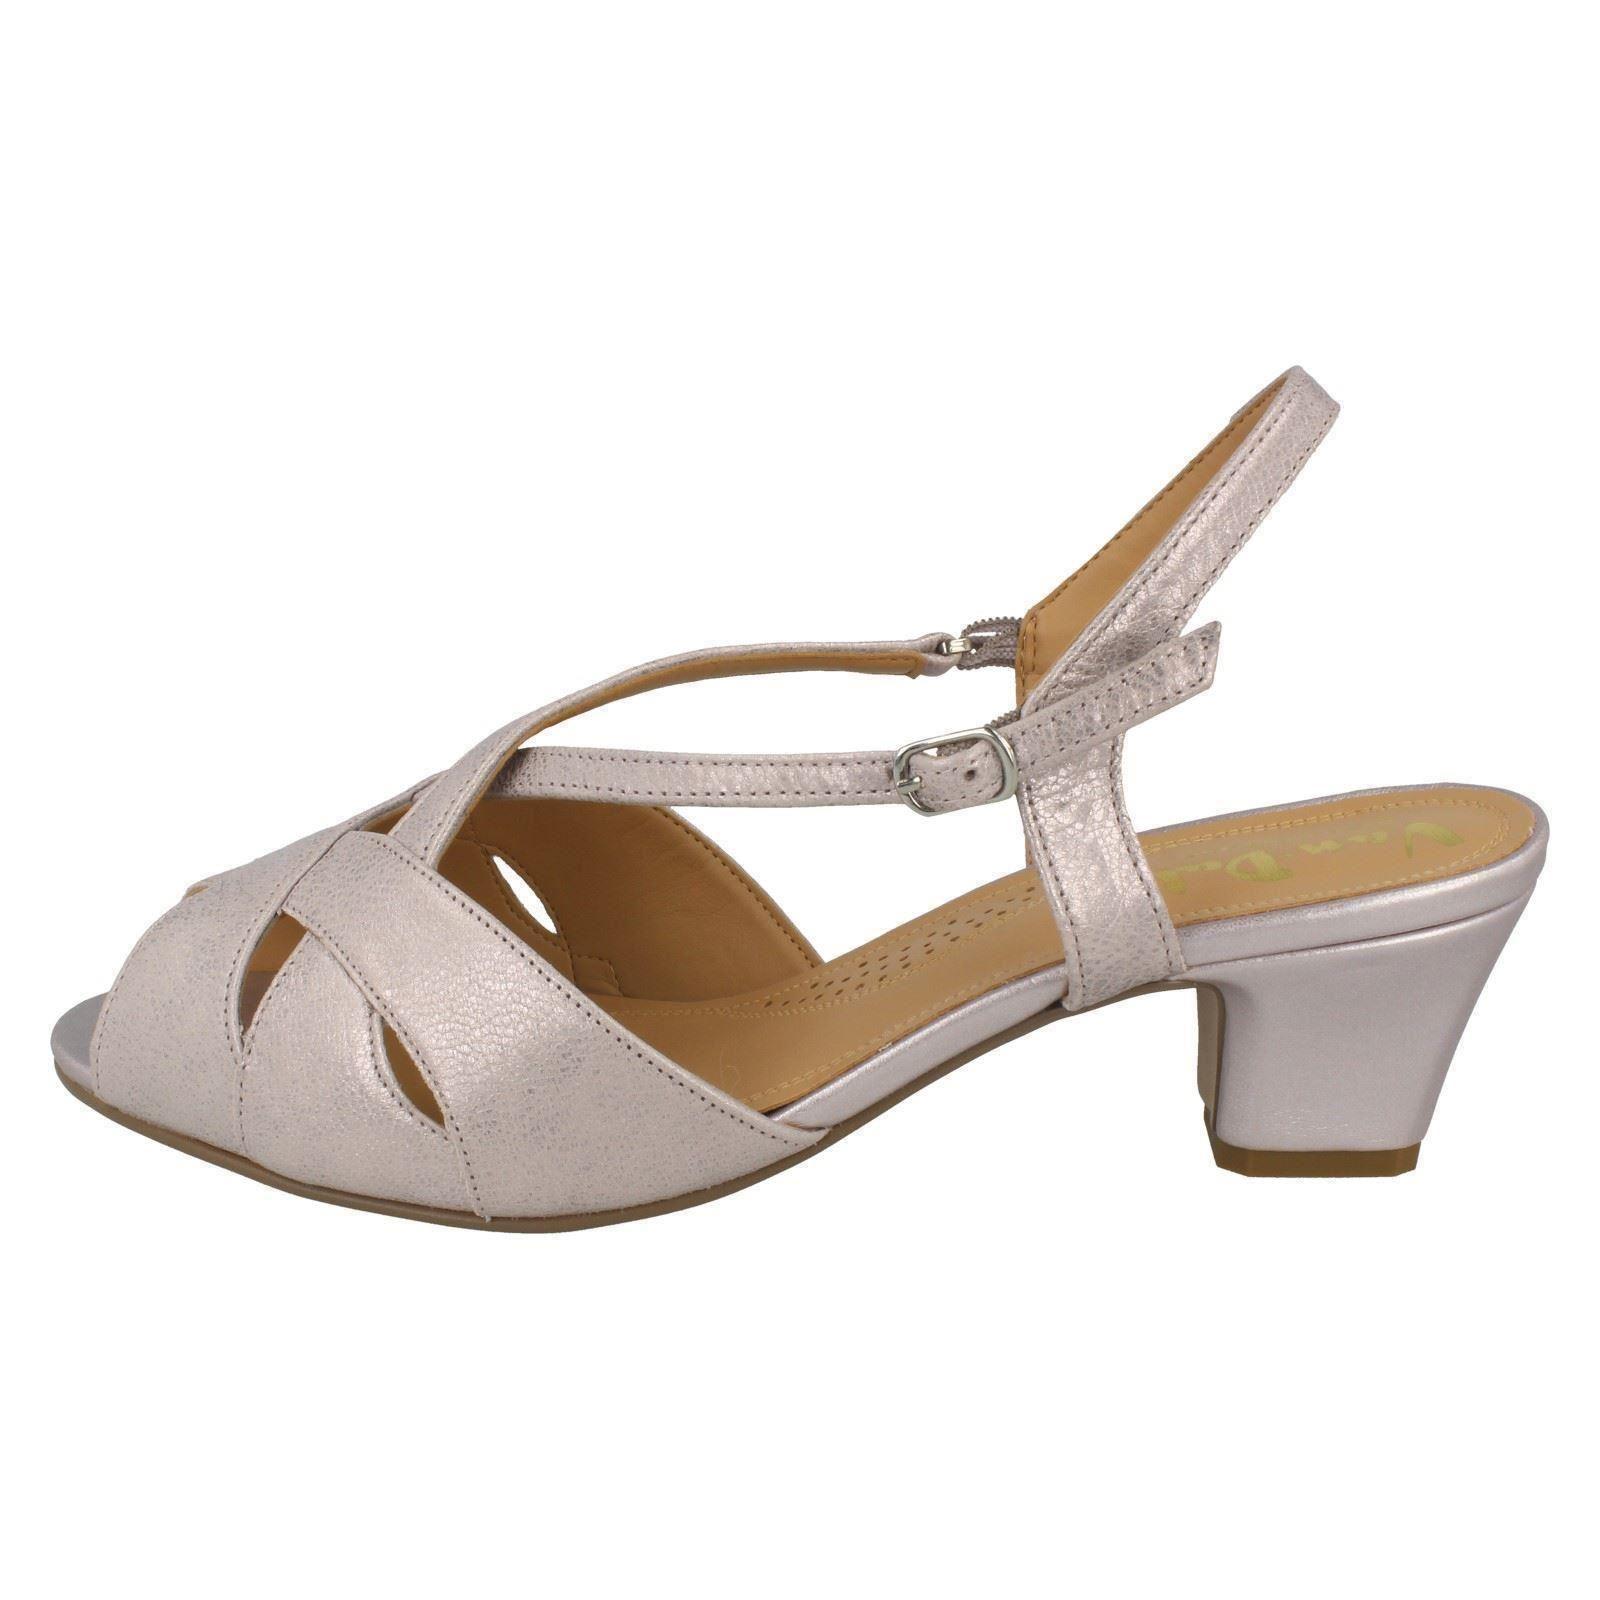 3df30ca5ca254 Van DAL Libby II Wide Fit Sandals Bamboo Metallic 6 for sale online ...